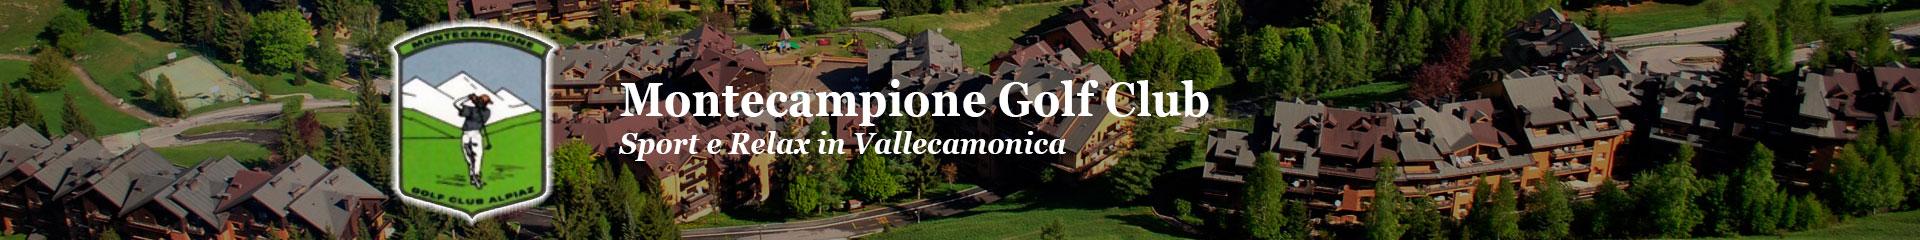 Montecampione Golf Club – Calendario Gare 2020